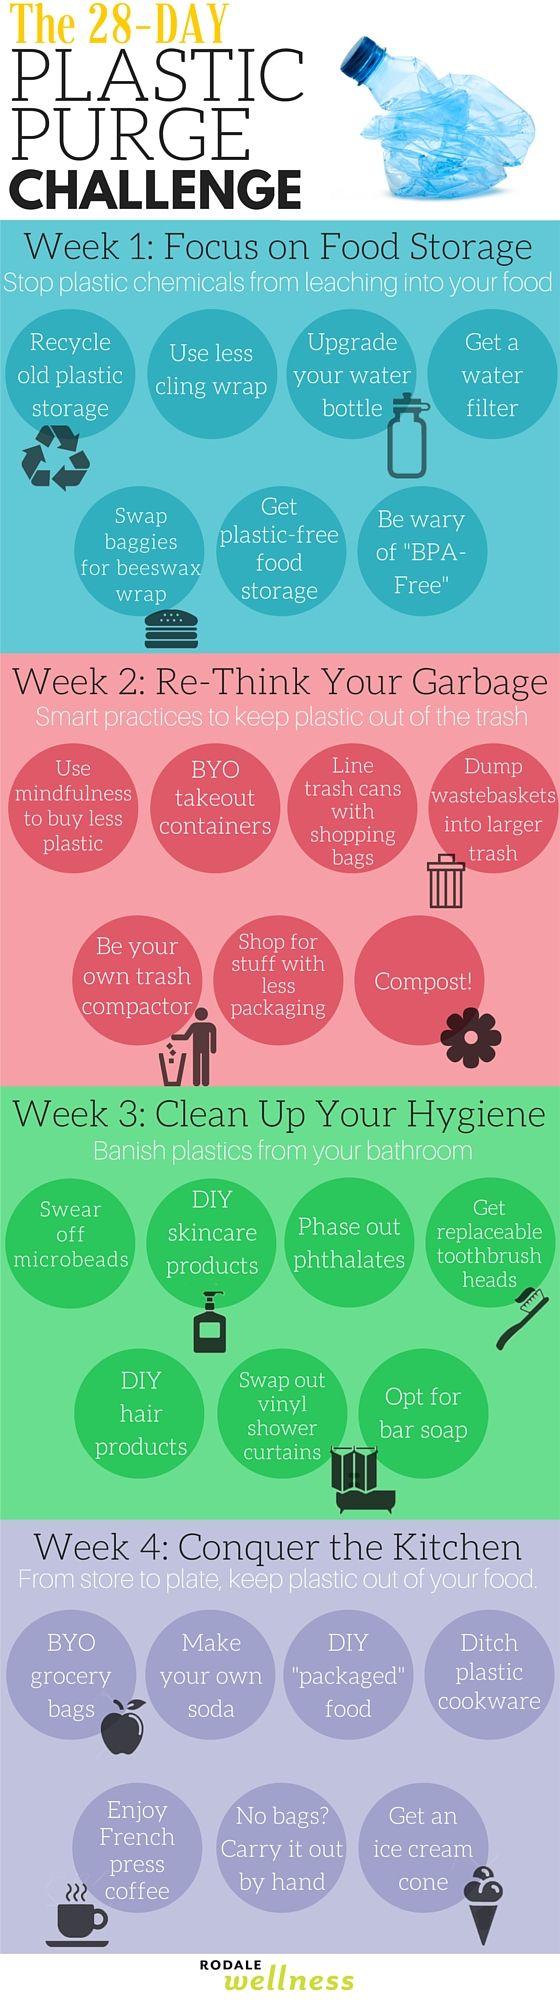 28-day plastic-free challenge